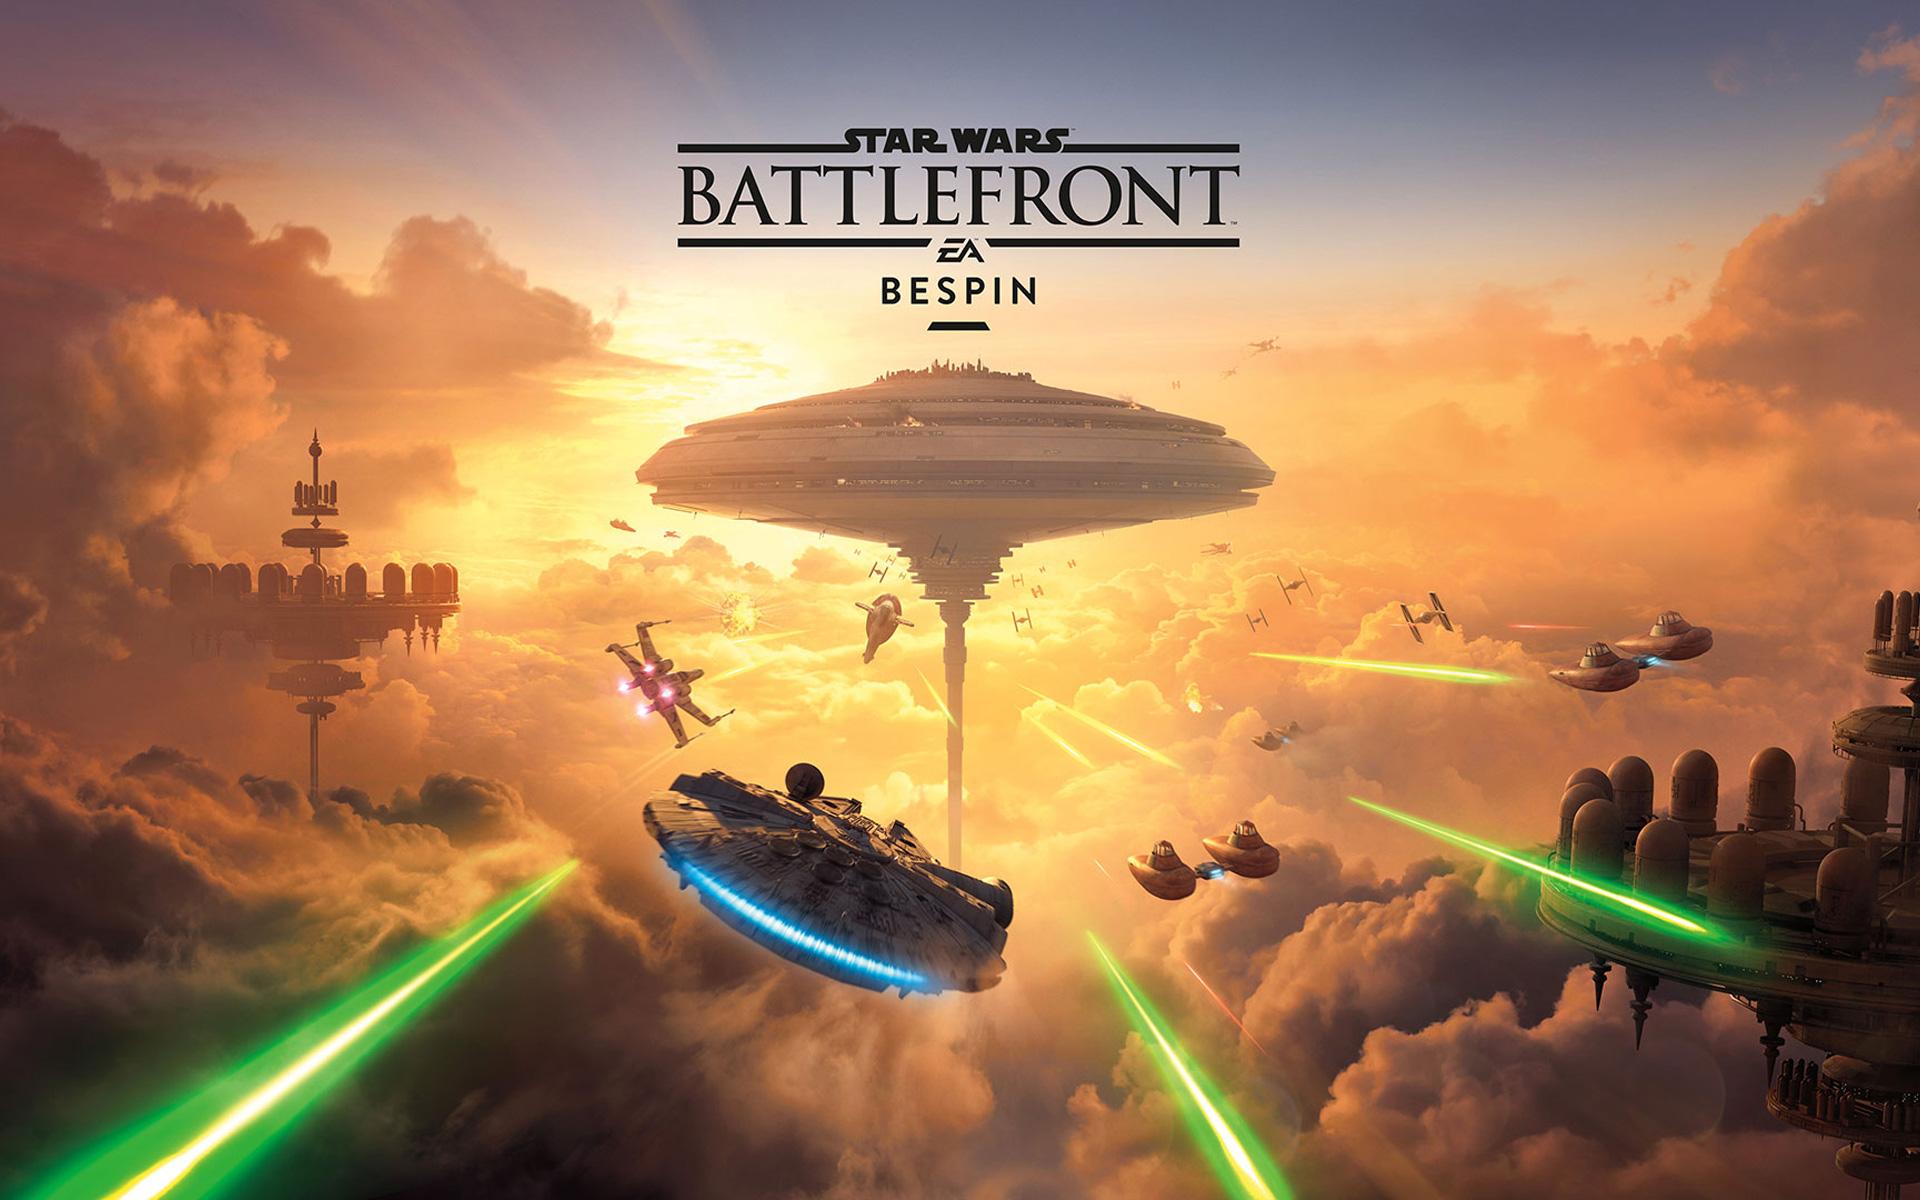 Free Star Wars: Battlefront Wallpaper in 1920x1200